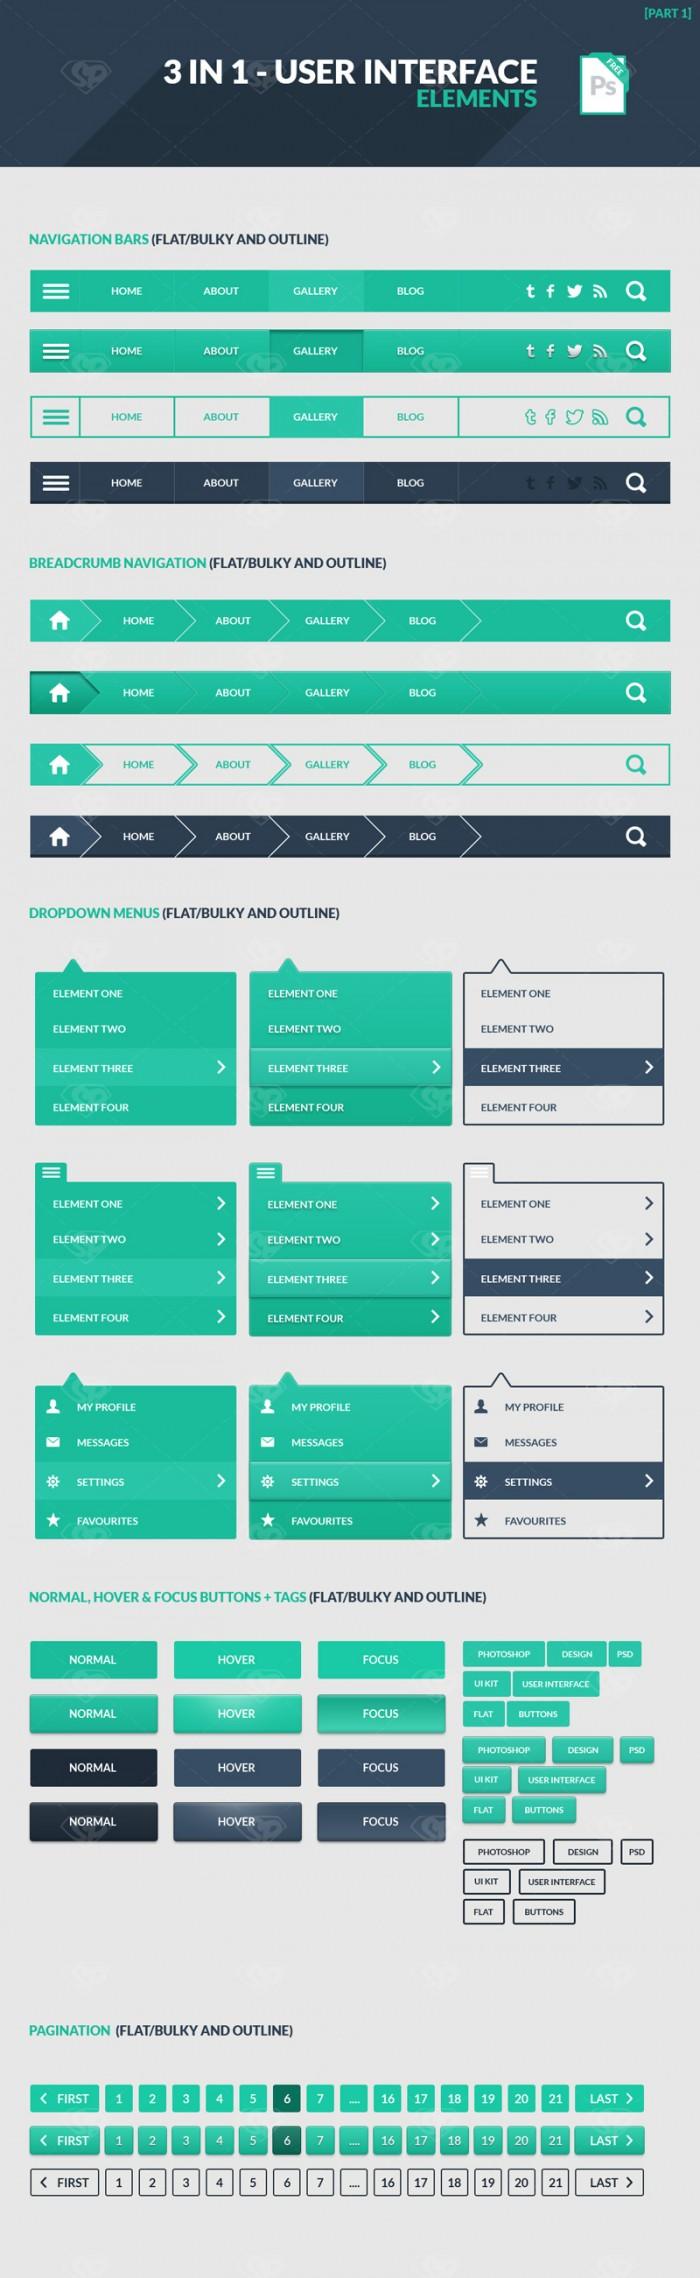 interfaces-graficas-ui-diseñadores-4